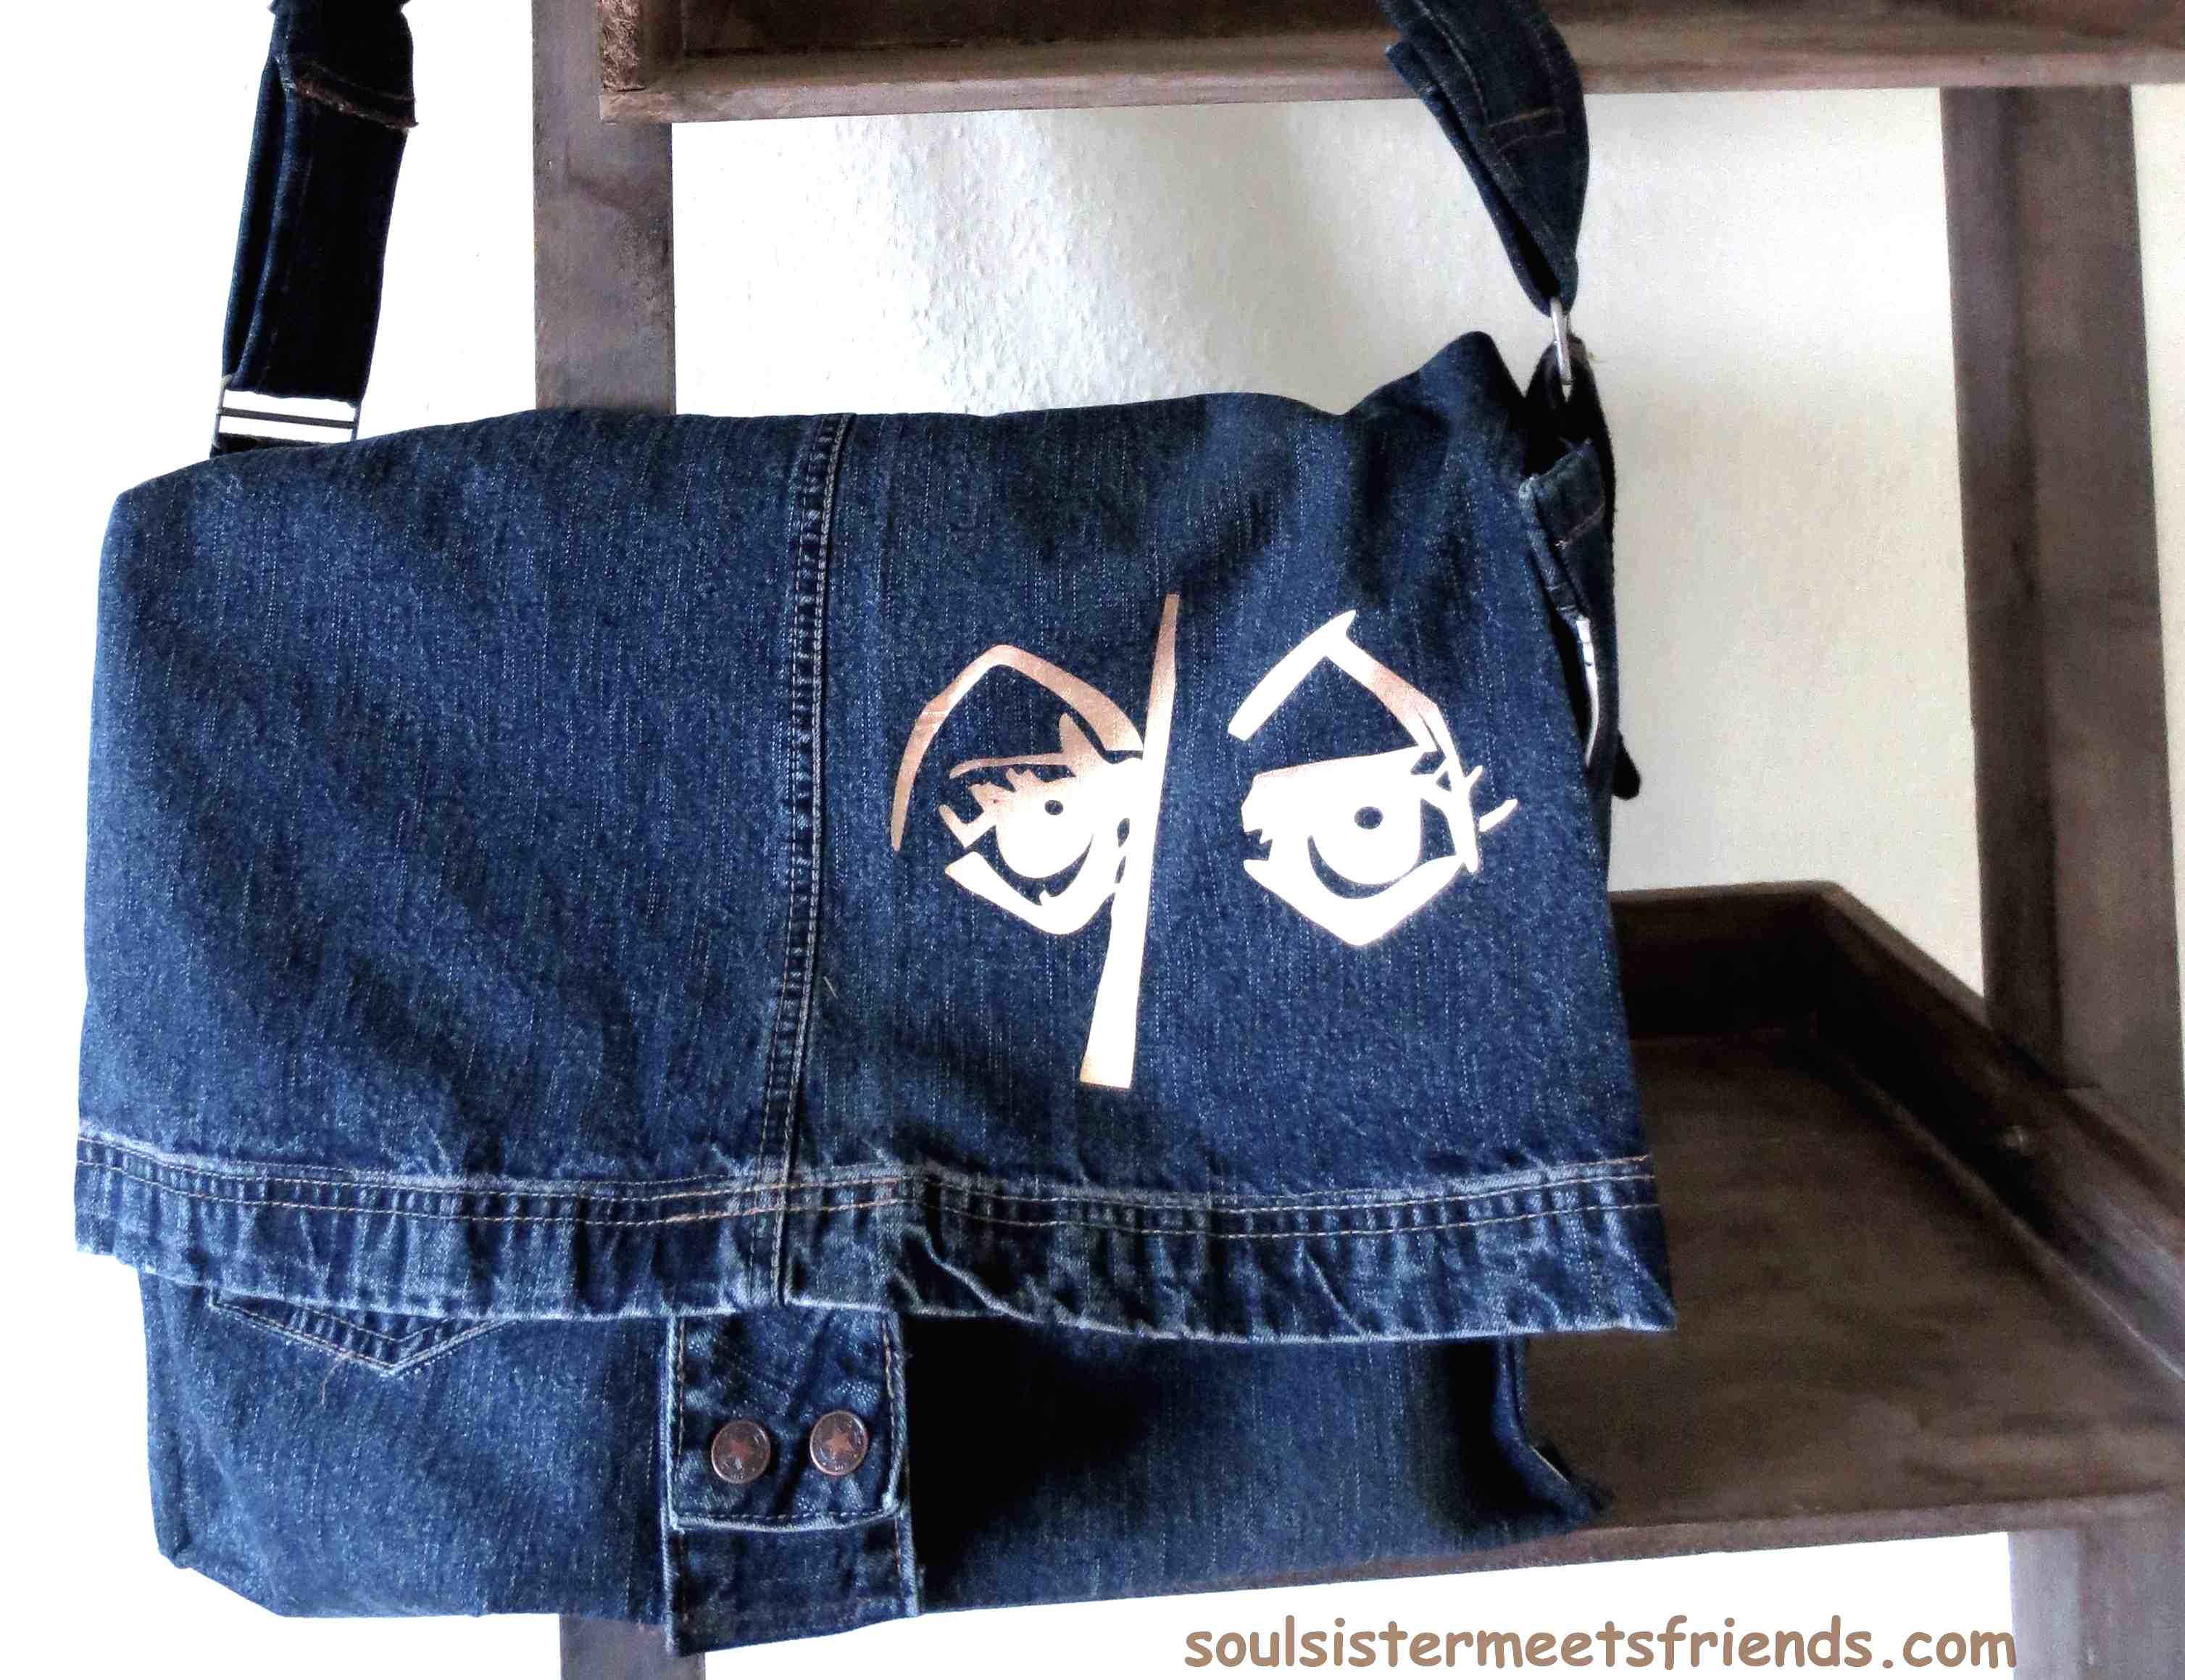 Jeanstasche Spendenhandel_smf